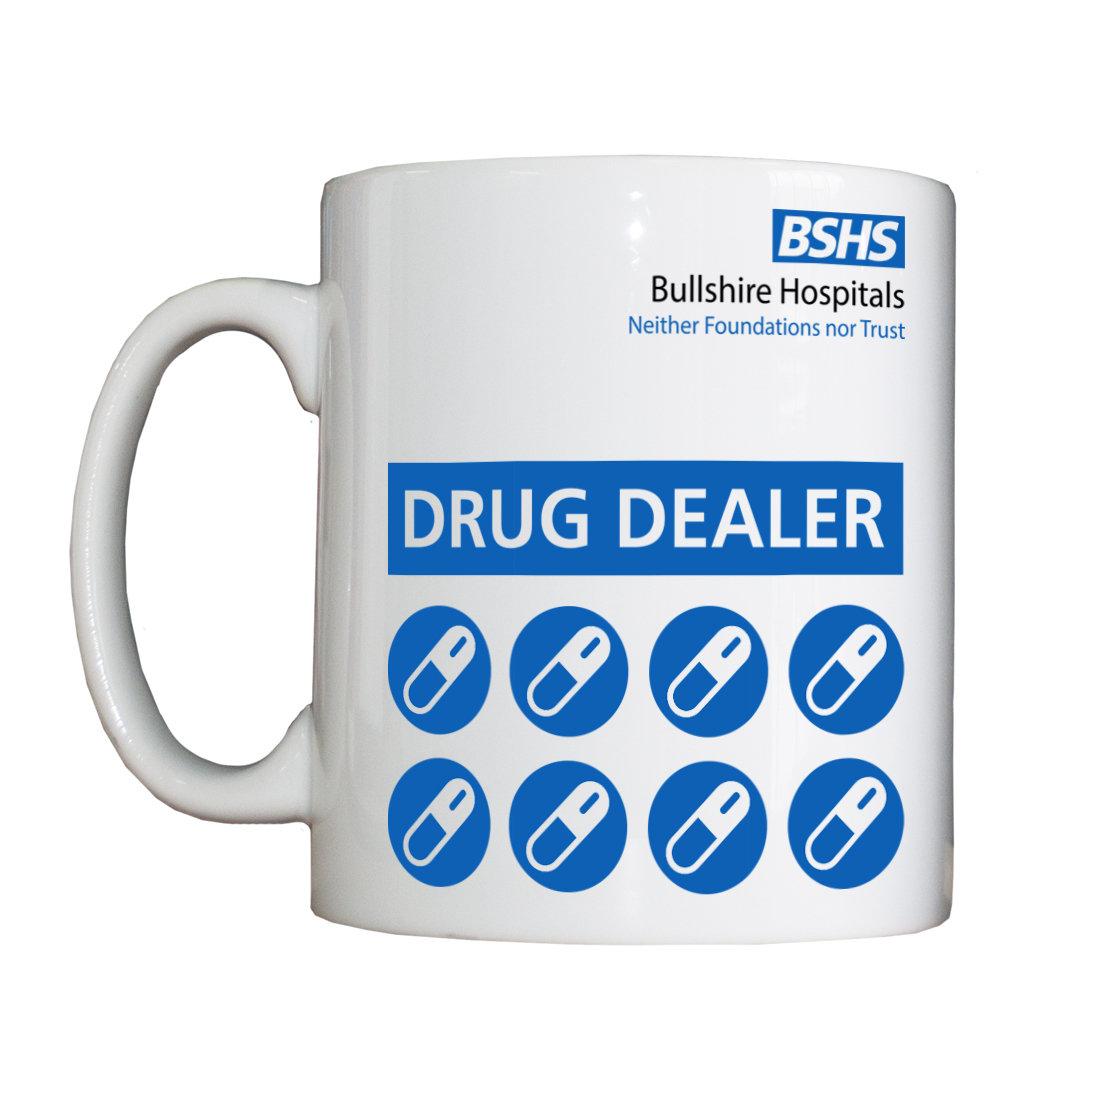 Personalised 'Drug Dealer' Drinking Vessel BSHSDrugDealerPharmacistVessel